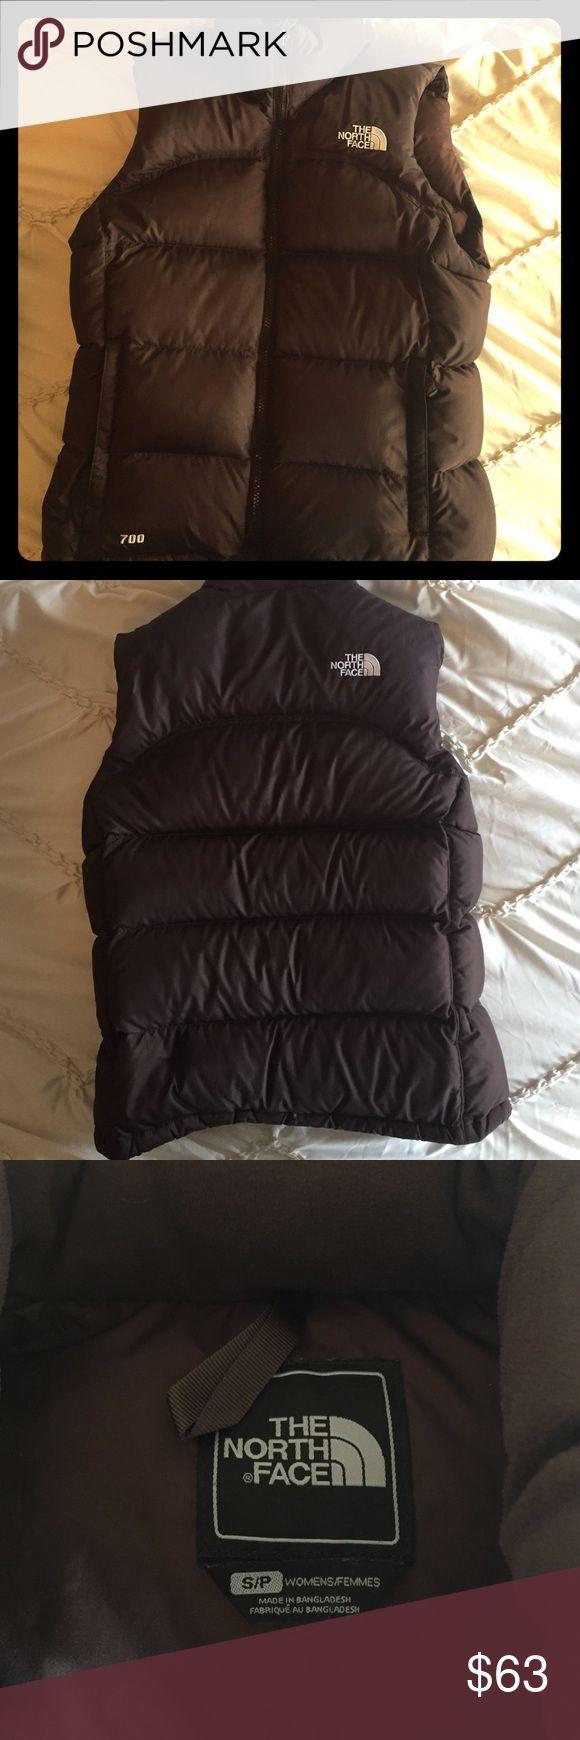 North Face women's Nuptse vest North Face Nuptse 700 fill vest.  Very good condition!!! North Face Jackets & Coats Vests